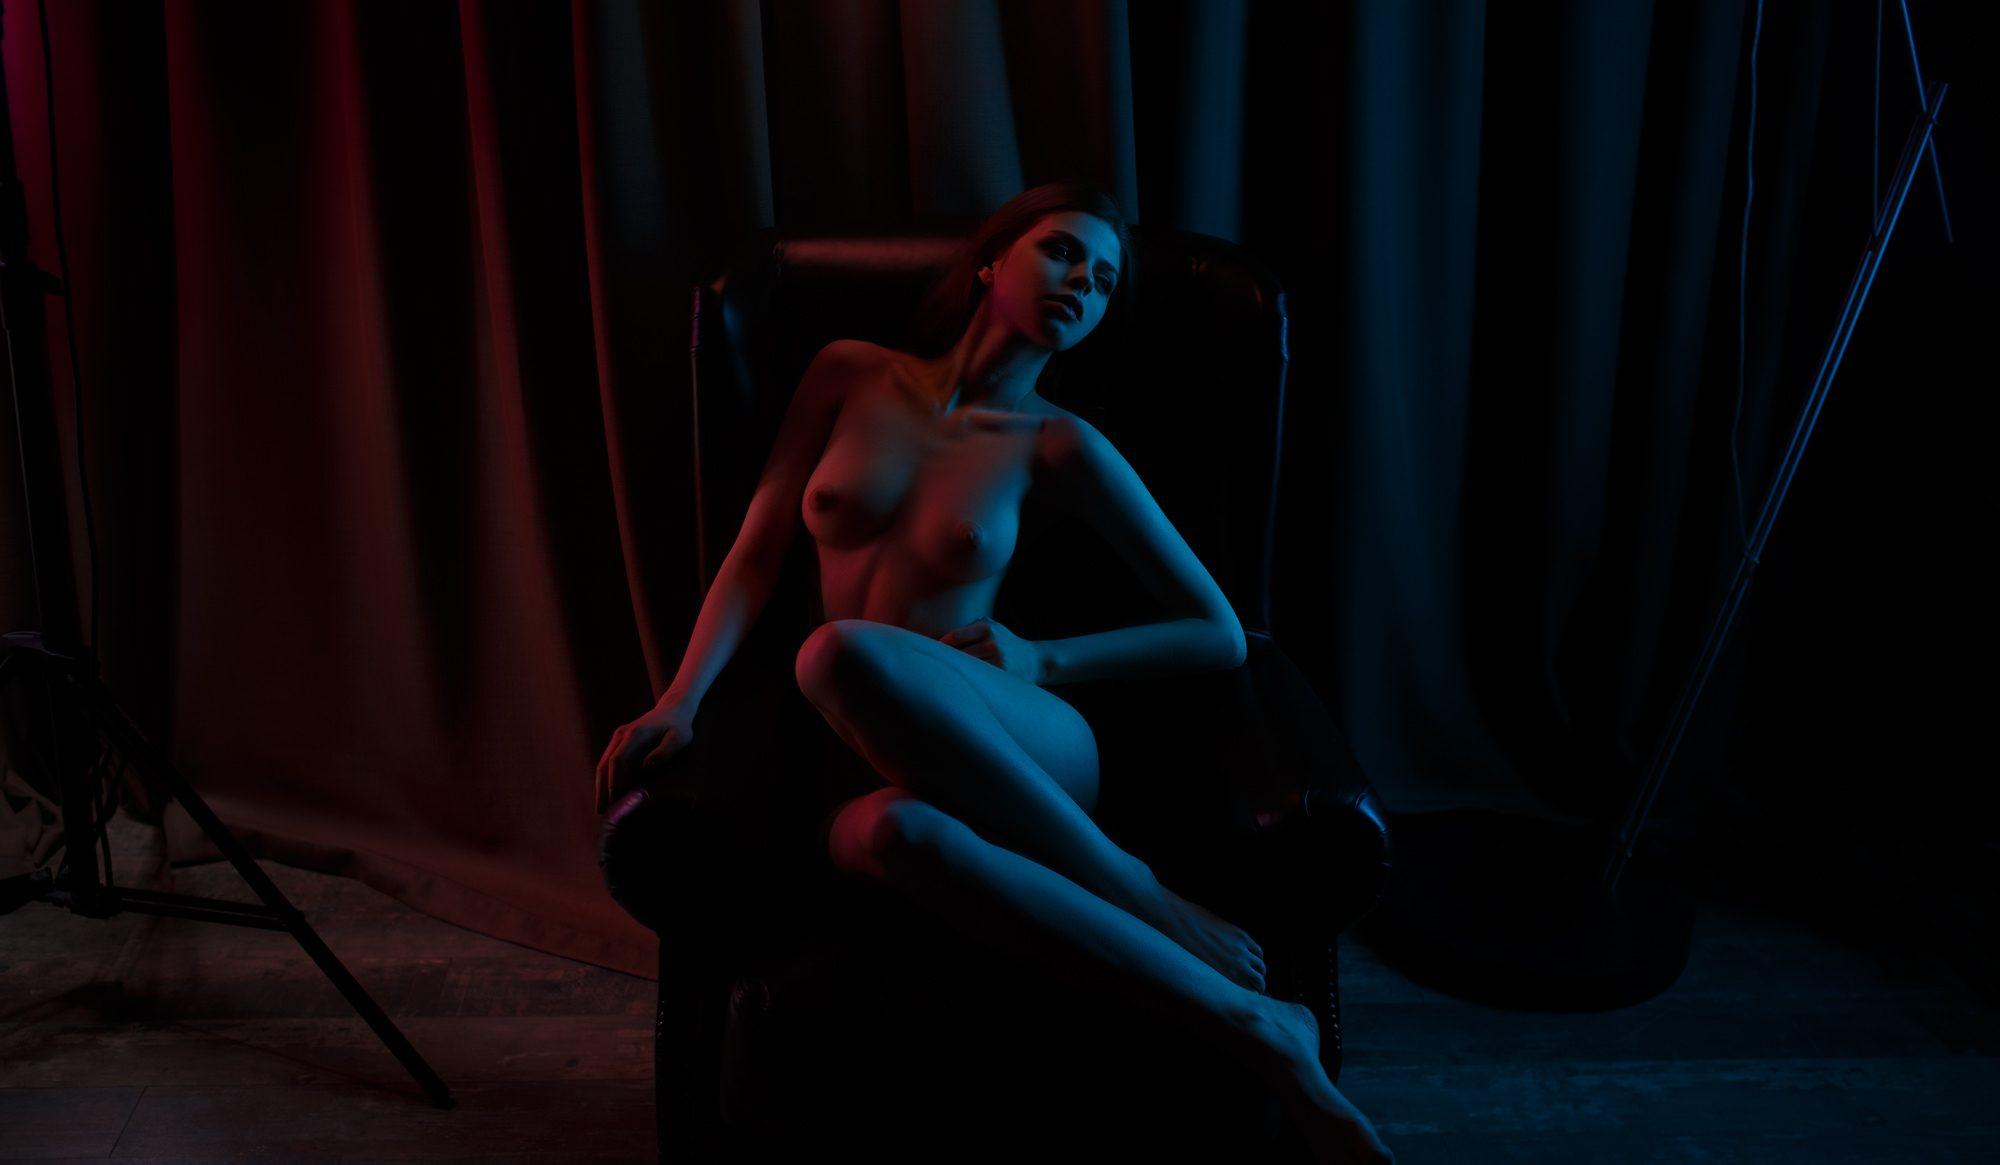 Veronika by Anton Demin 1